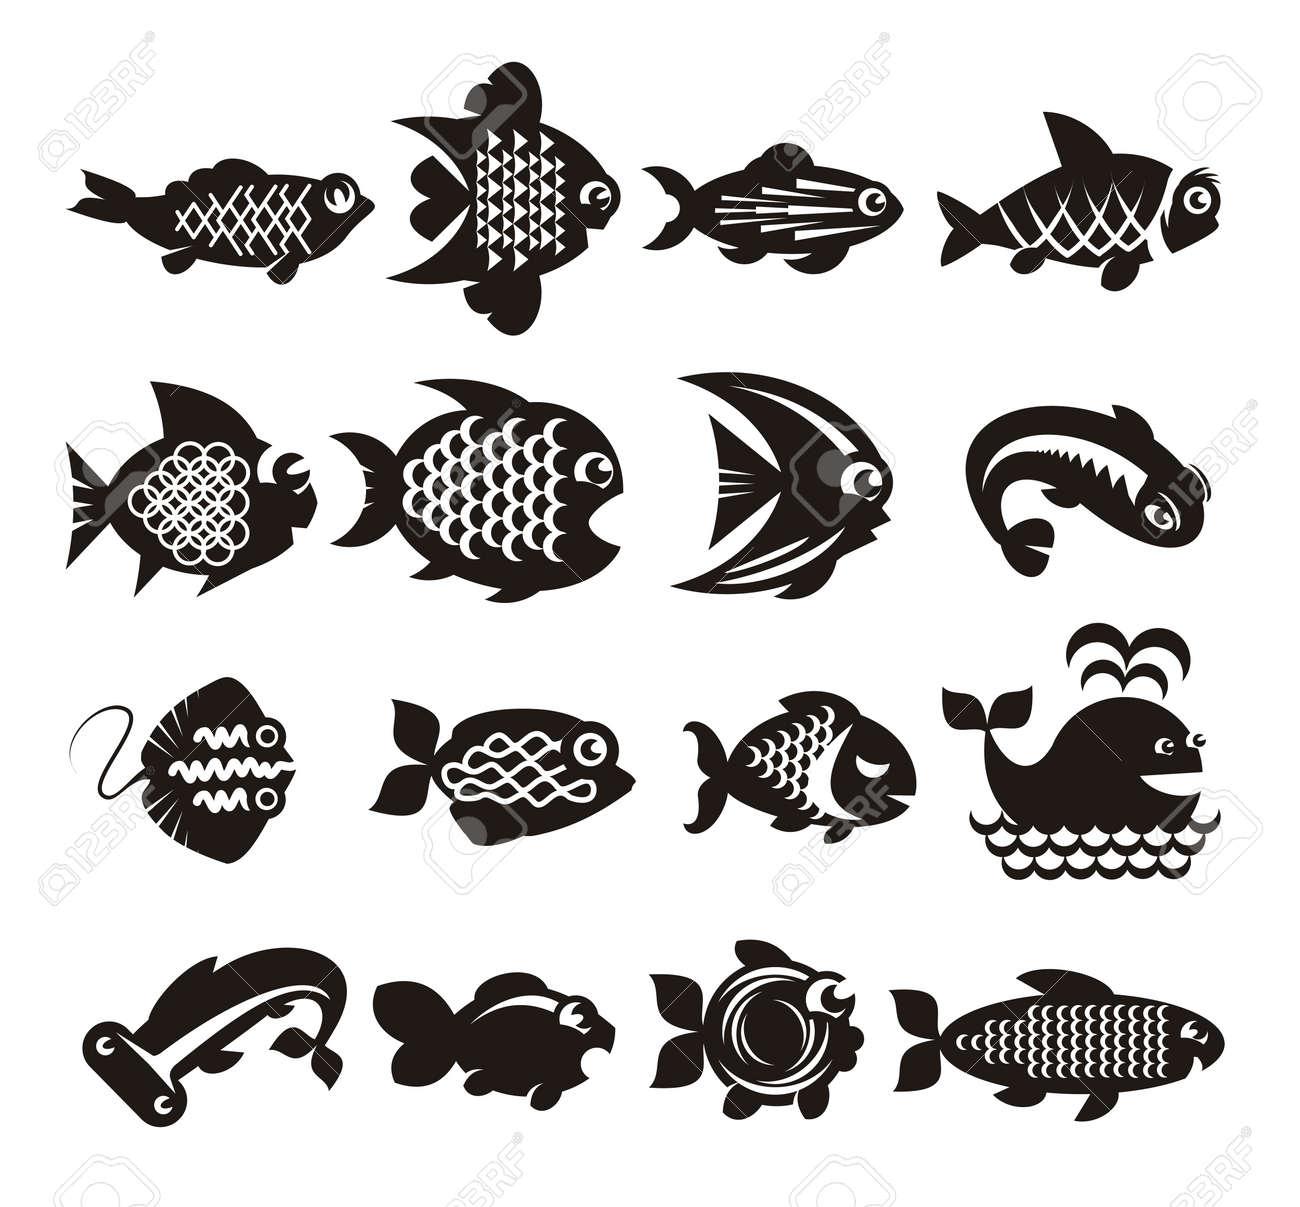 Fish icons set Stock Vector - 21425434